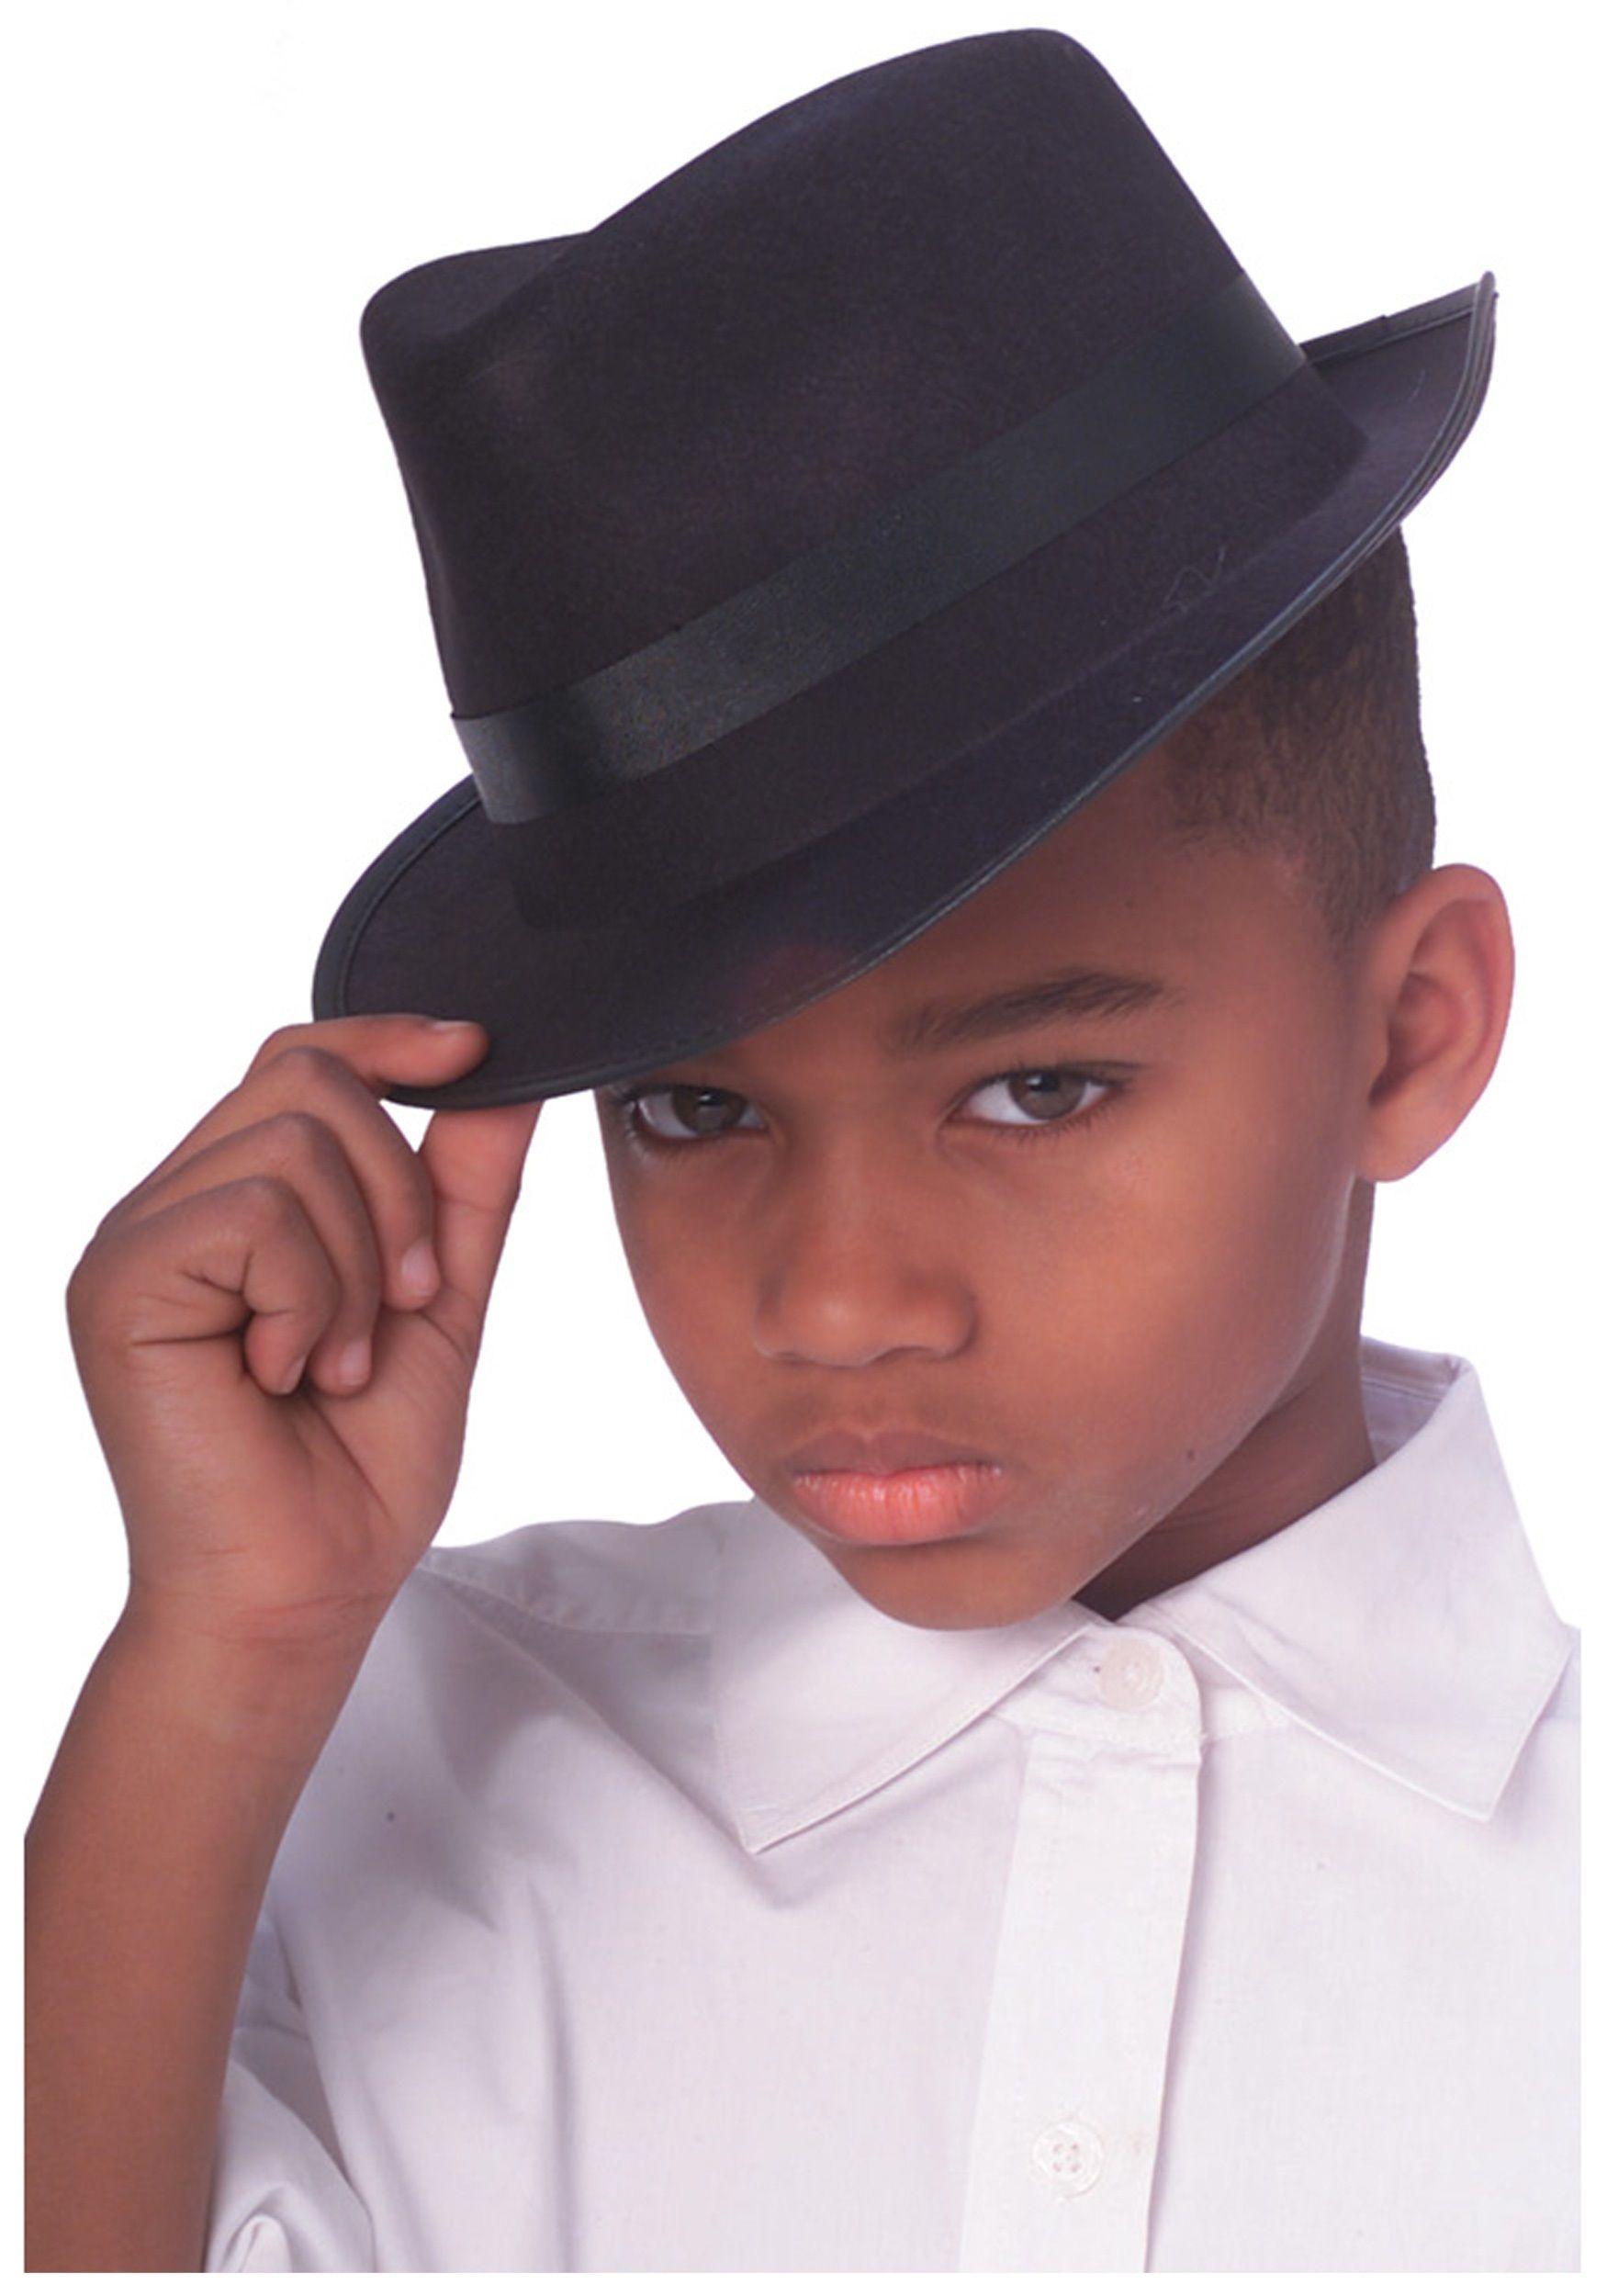 WHITE LITTLE BOYS FEDORA HATS PICS  c13d836bb5f